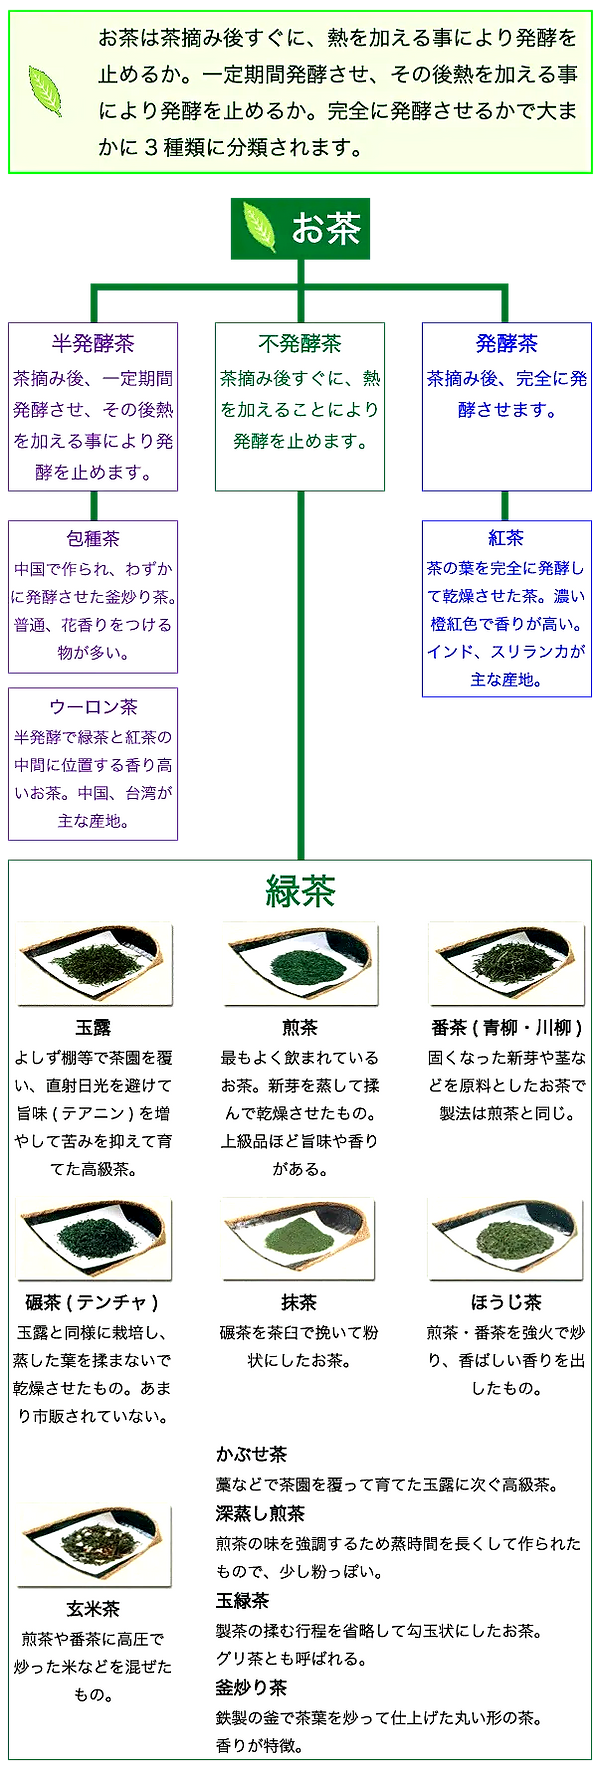 syurui_edited_edited.png